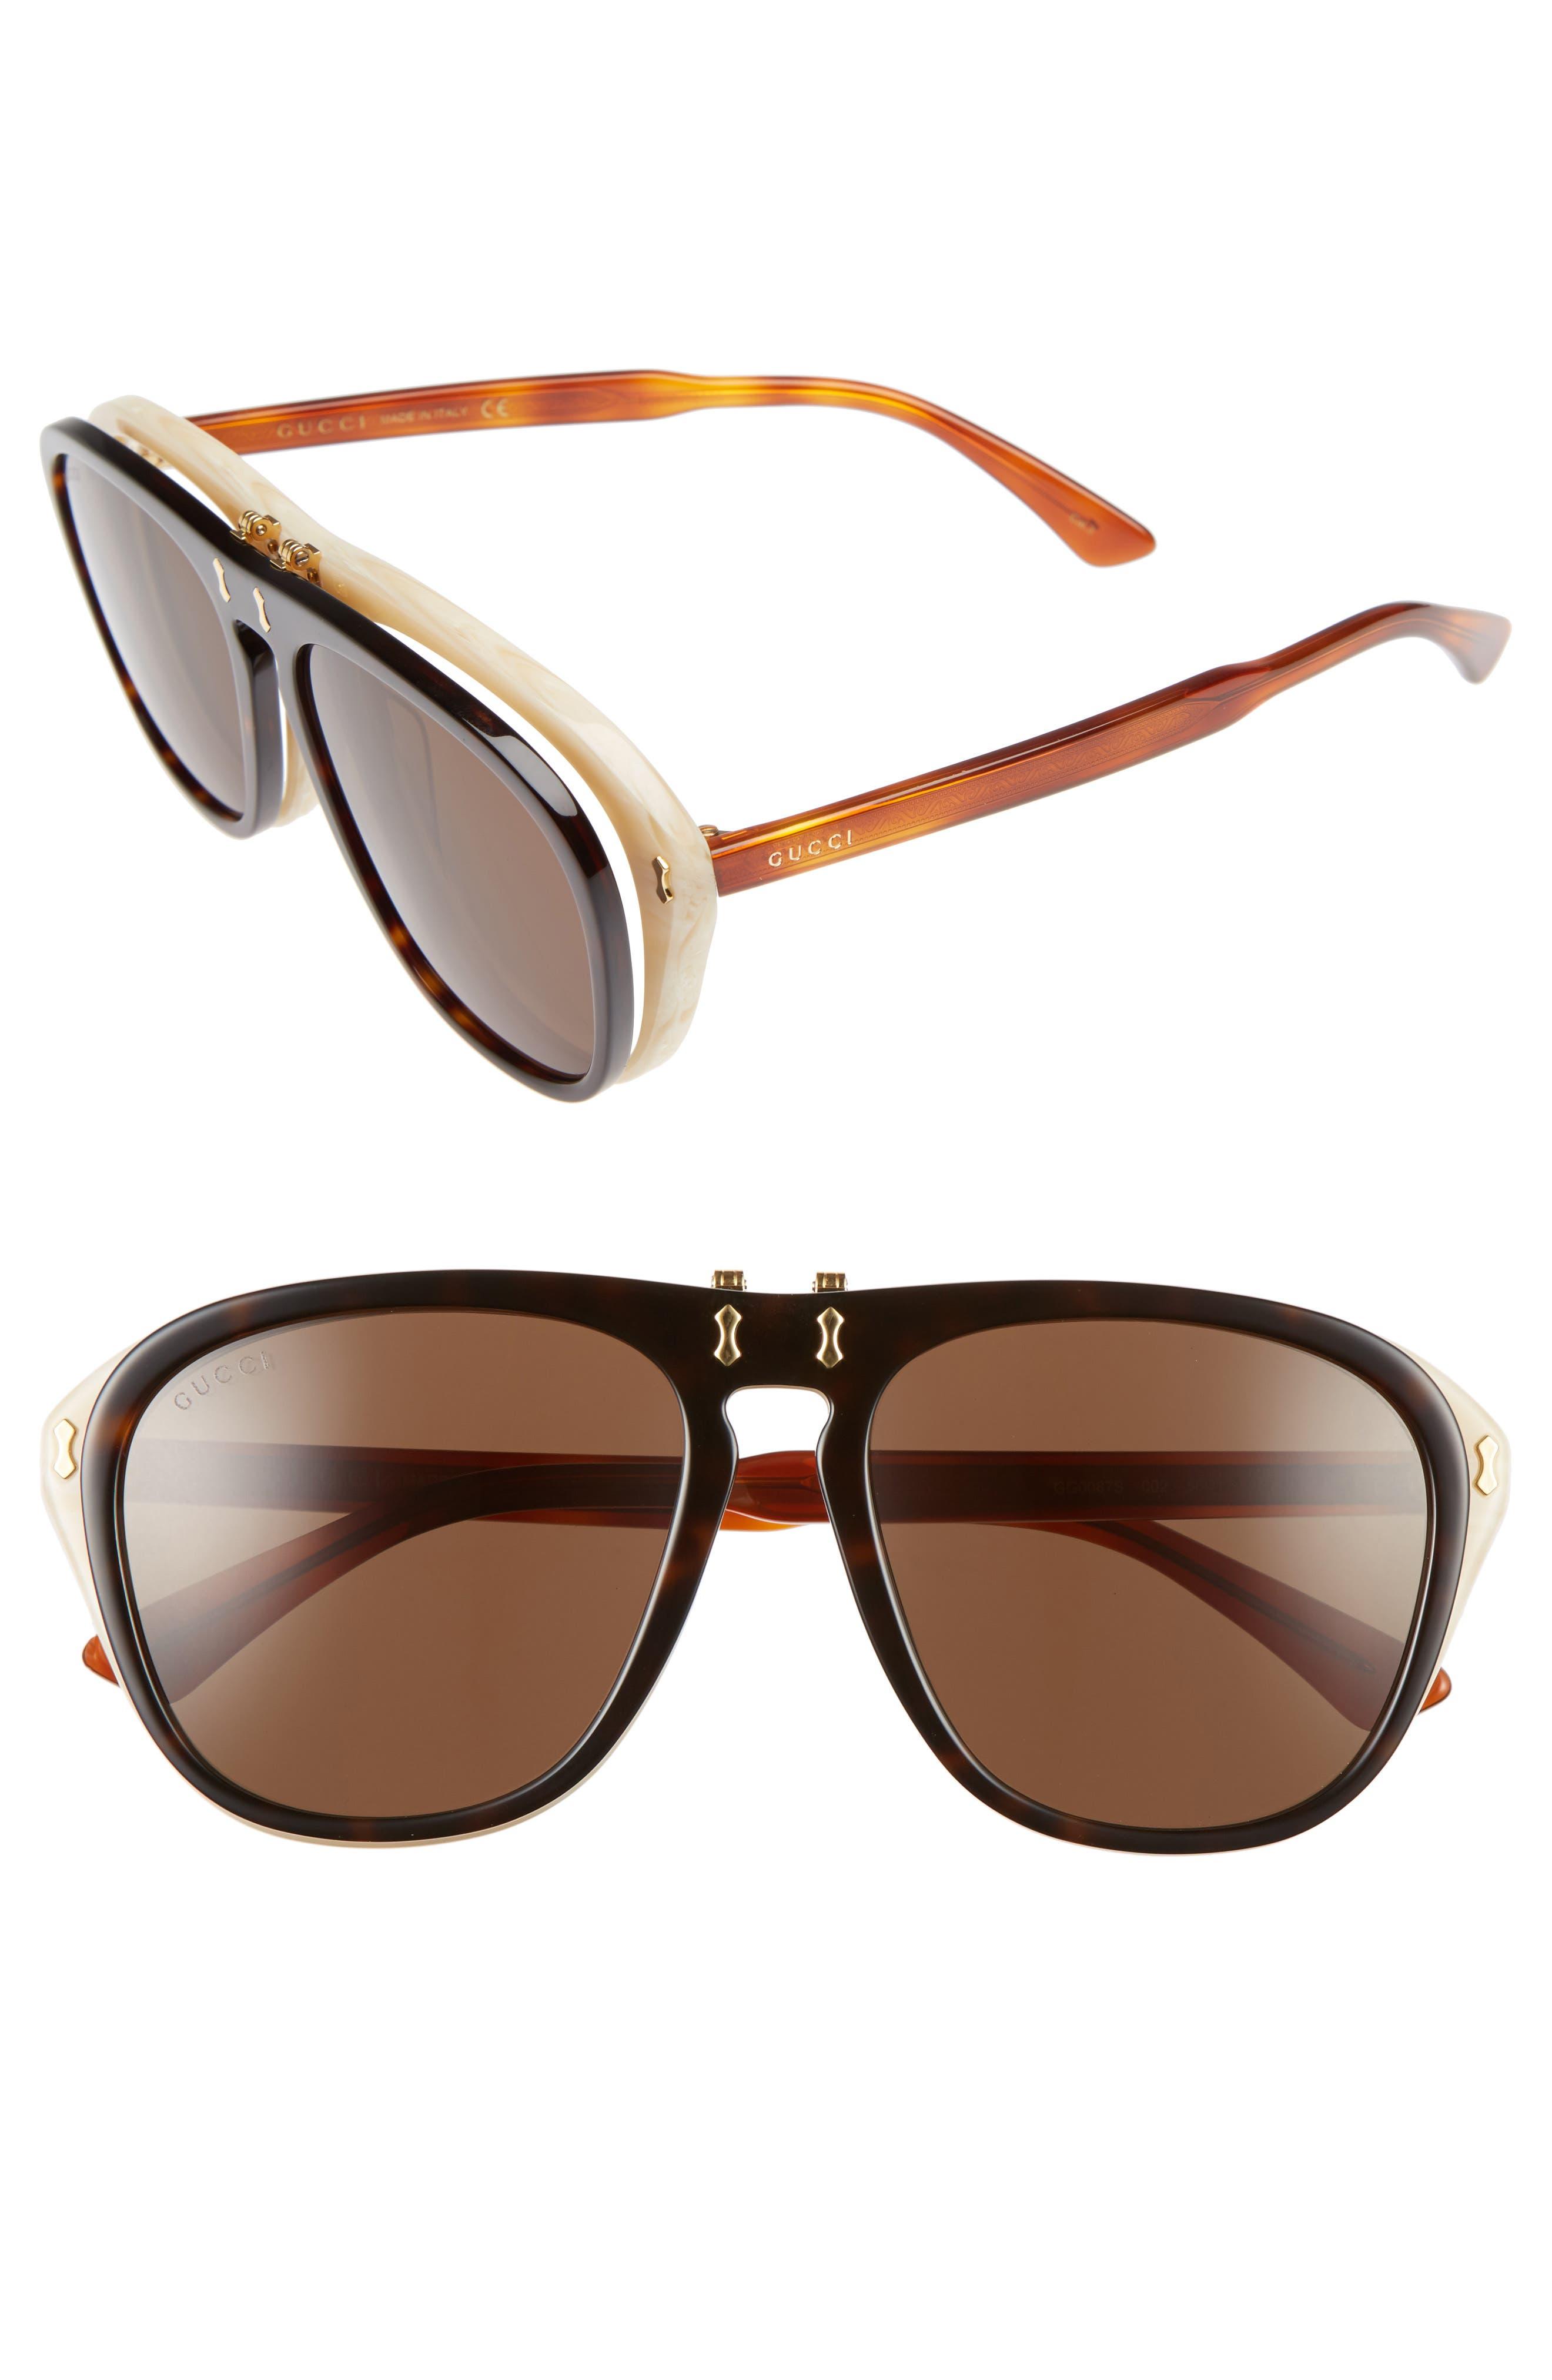 Alternate Image 1 Selected - Gucci 56mm Flip-Up Sunglasses